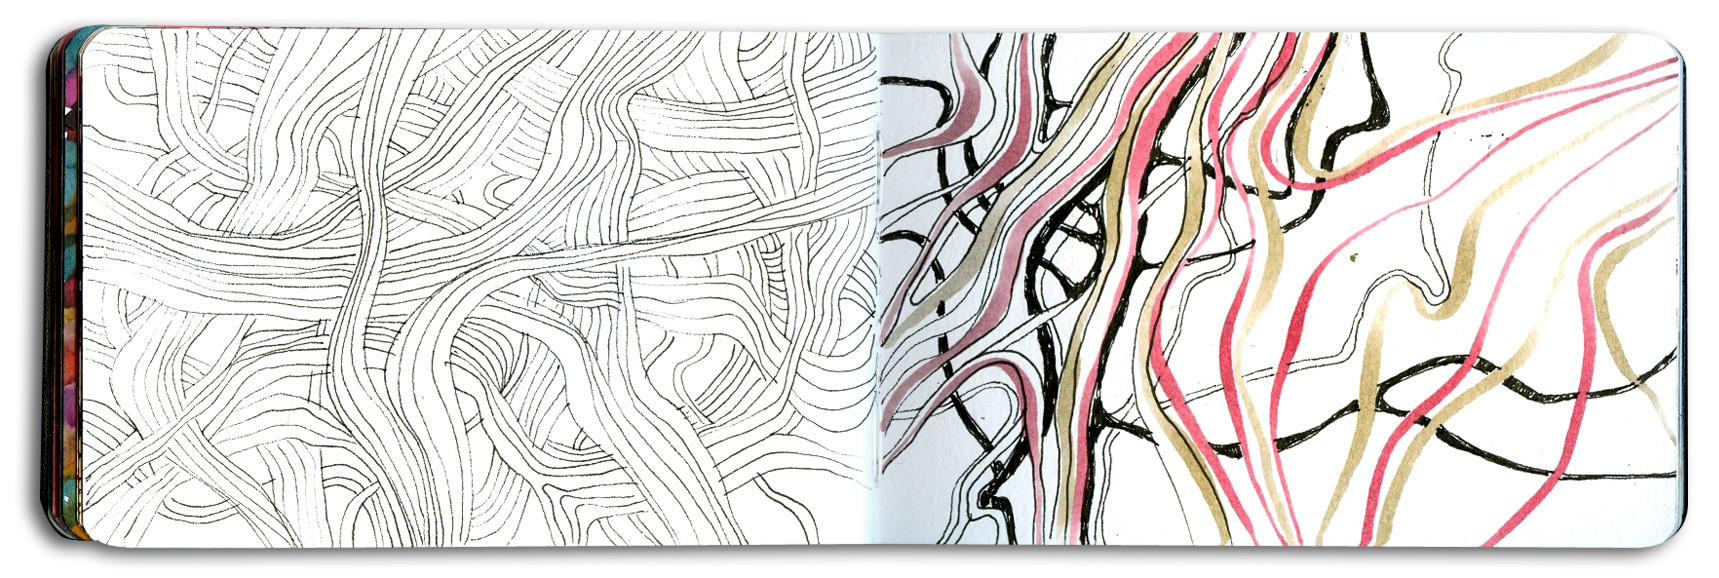 sketchbook small 2011/15